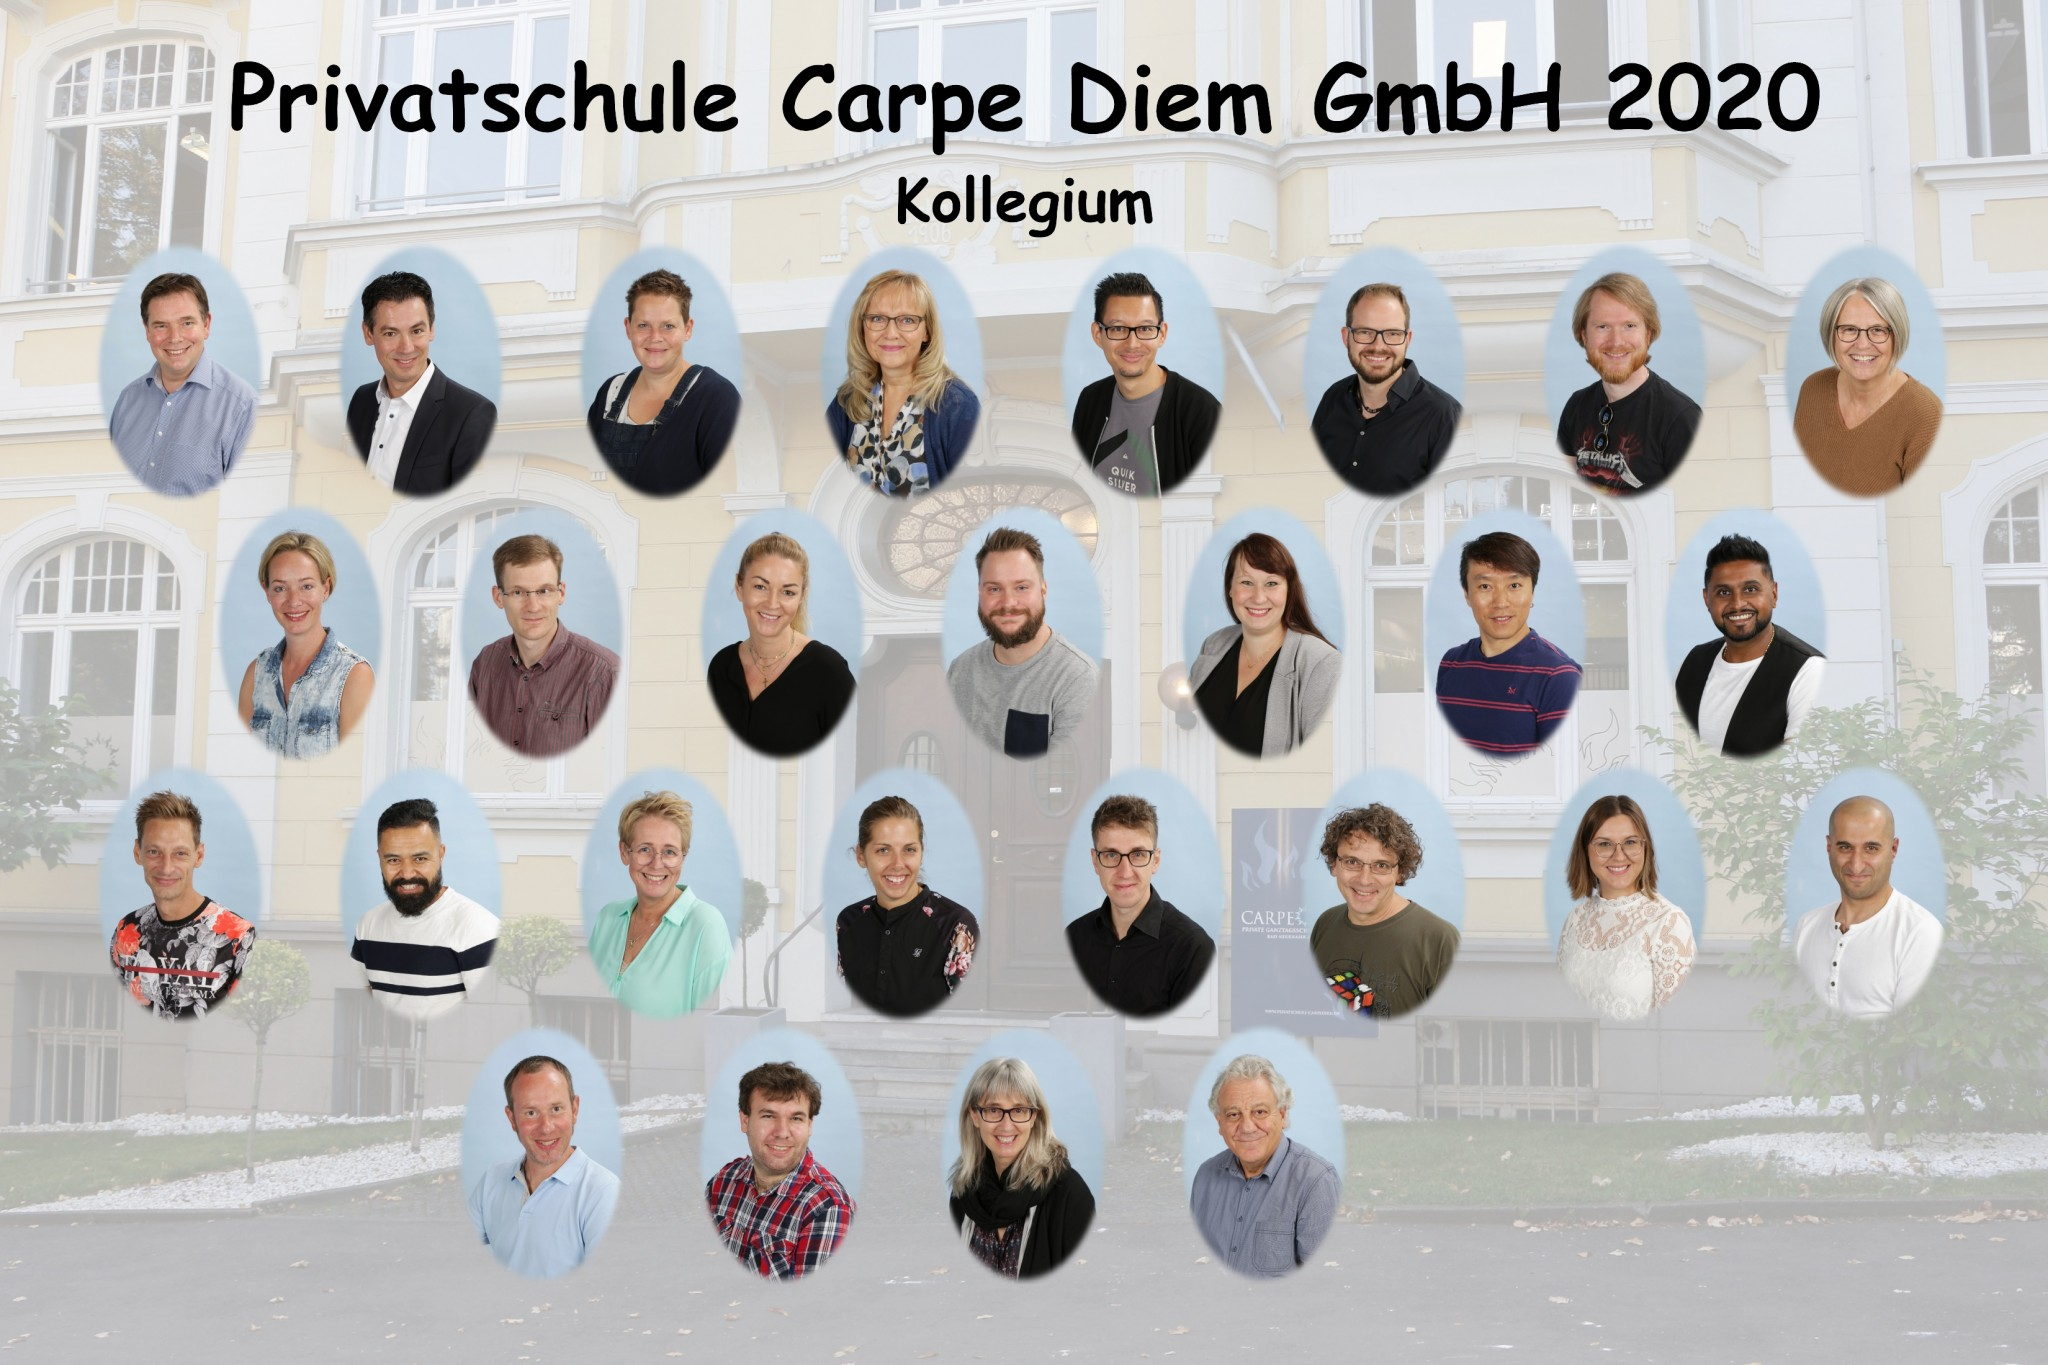 Kollegium Privatschule Carpe Diem